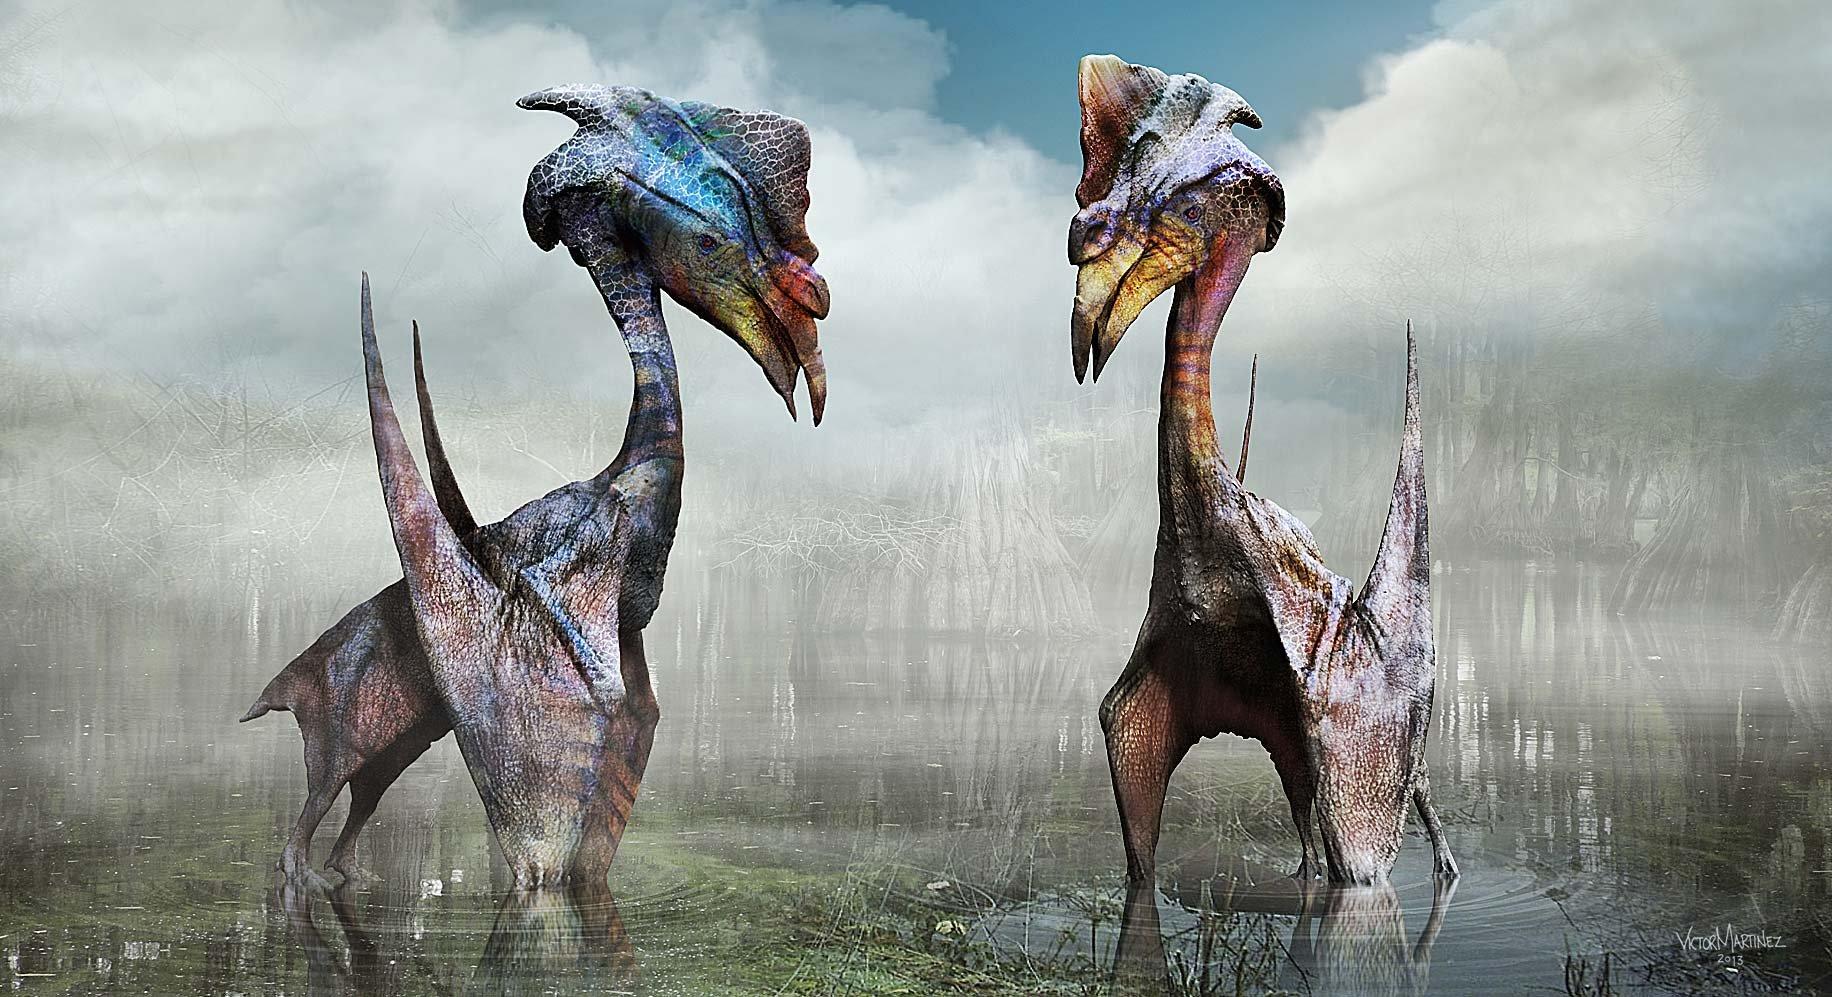 Victor martinez adultpterosaur05